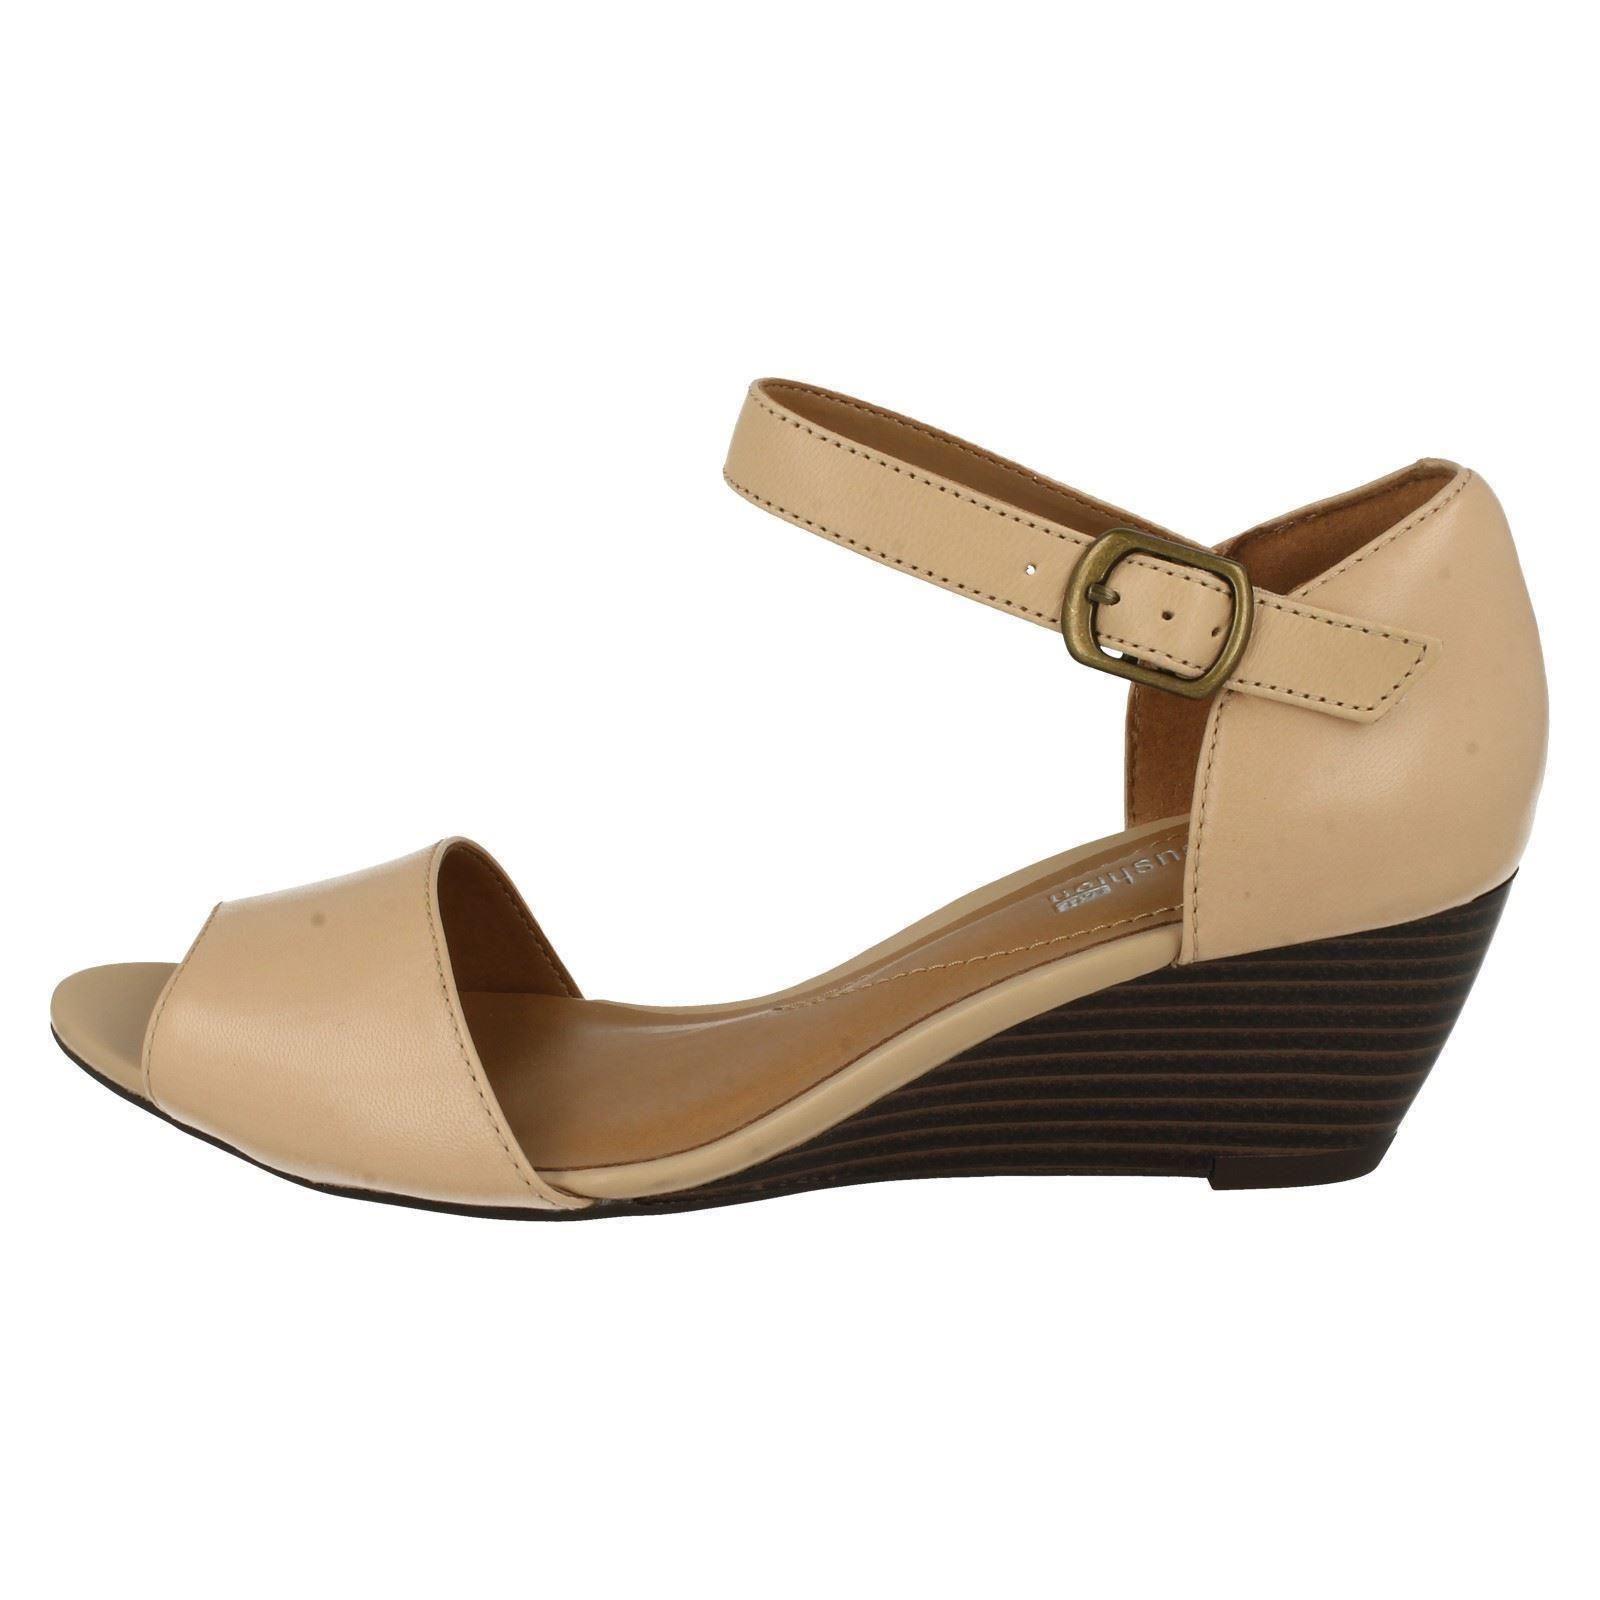 Clarks Clarks Clarks Ladies Smart Wedge Sandals Brielle Drive 8cb838